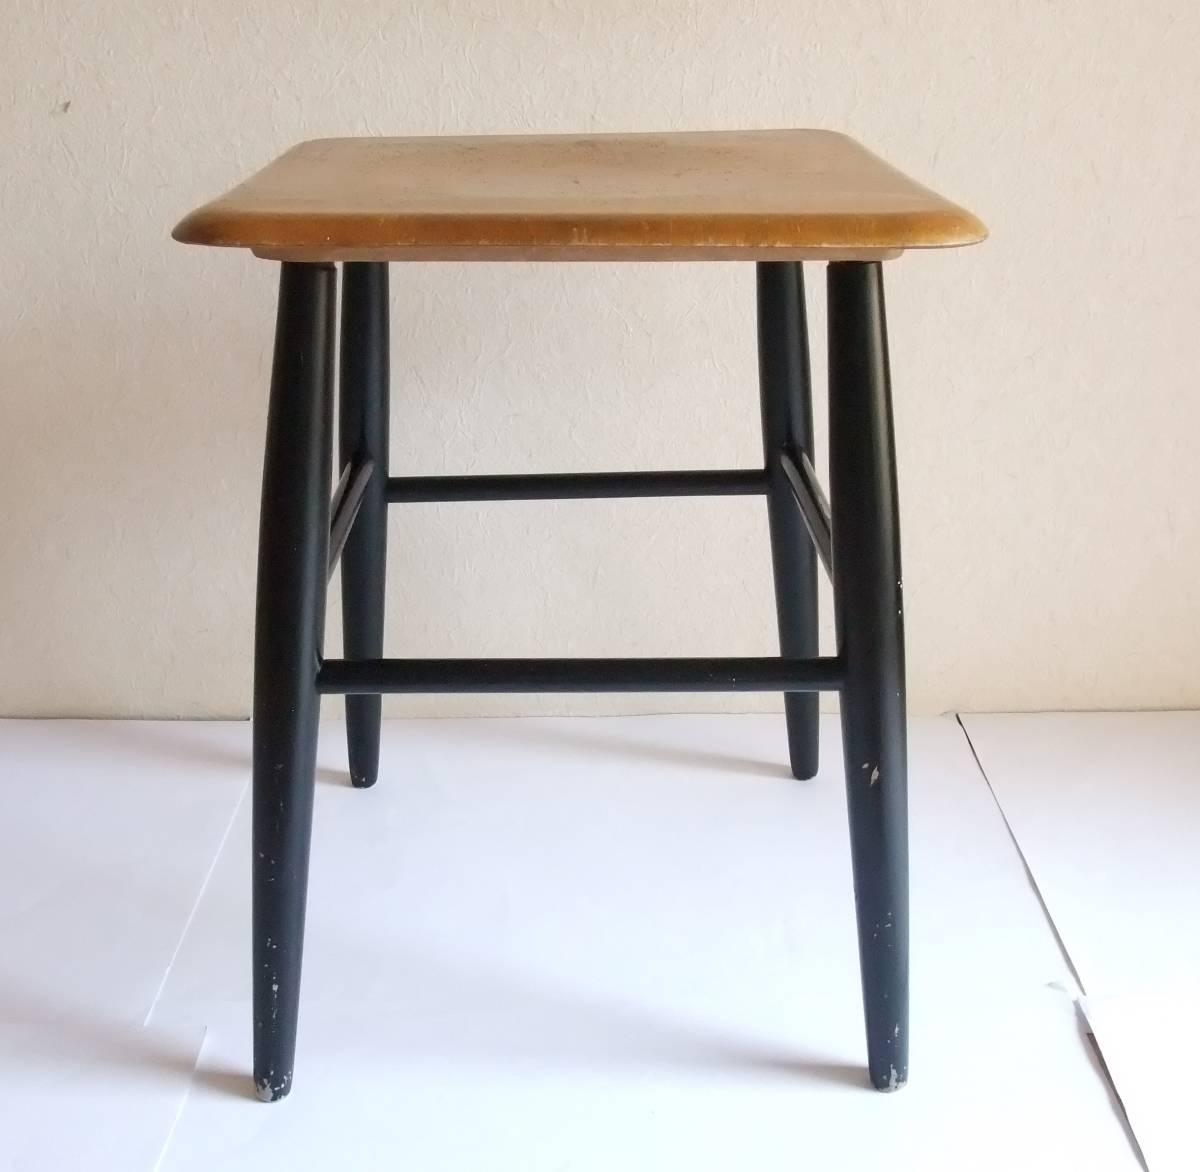 Remarkable Northern Europe Il Mali Tapiova Rough Net Stool Ilmari Theyellowbook Wood Chair Design Ideas Theyellowbookinfo